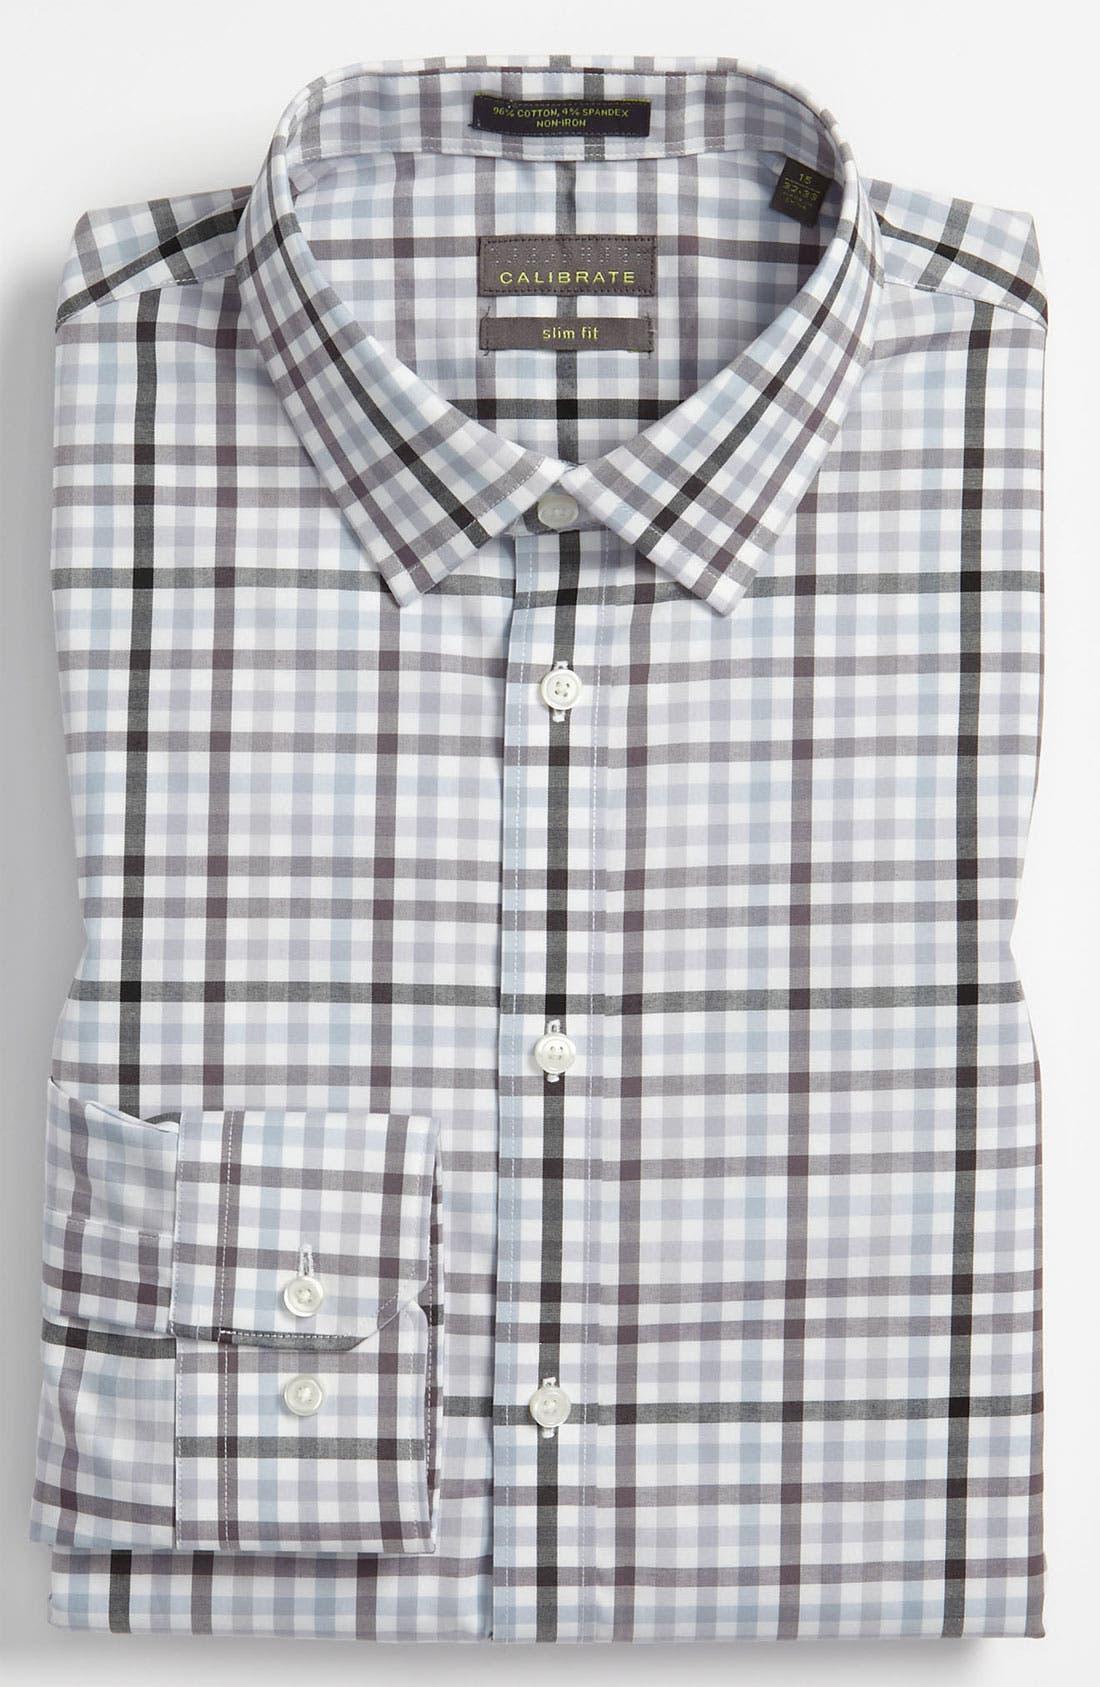 Main Image - Calibrate Slim Fit Non Iron Dress Shirt